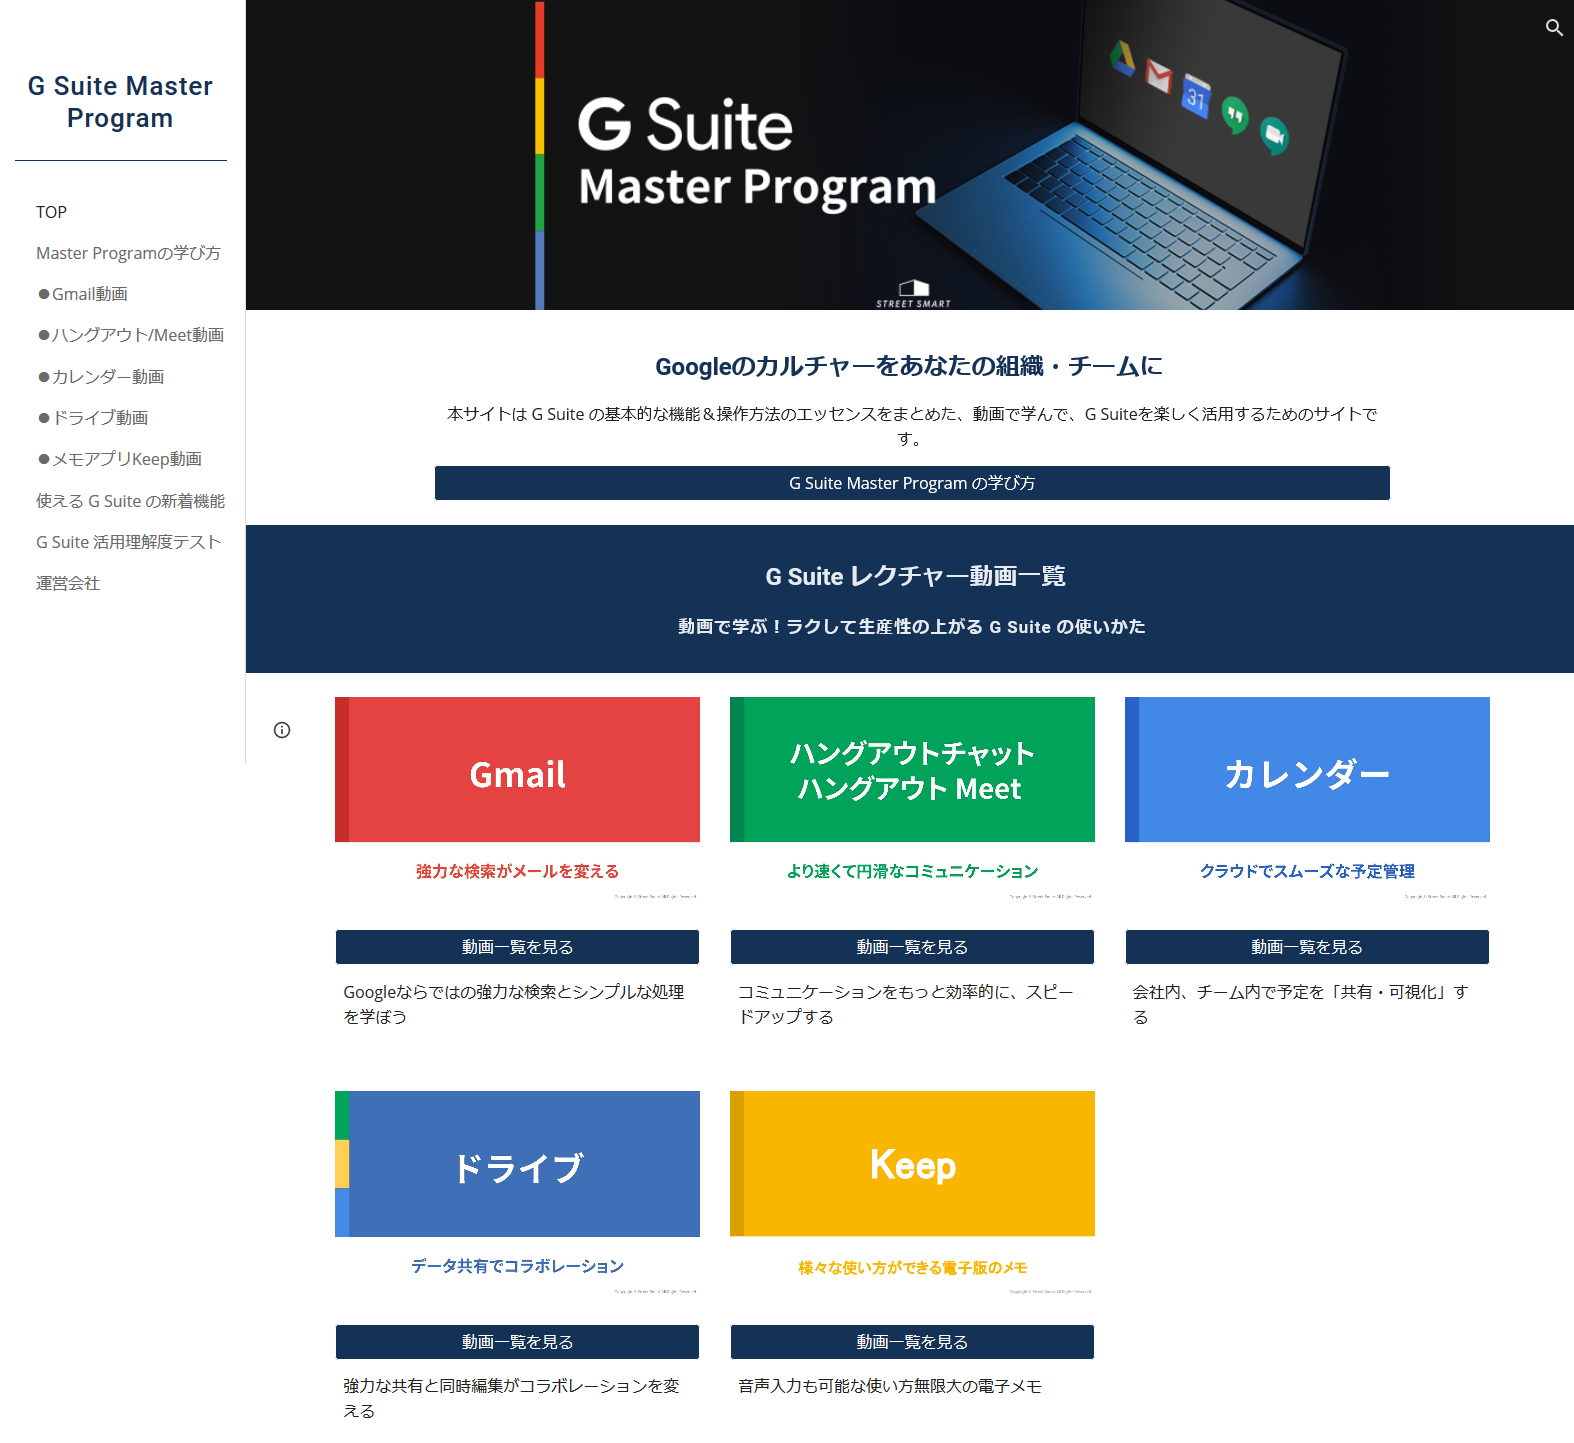 「Master Program」契約ユーザー向けトップページ